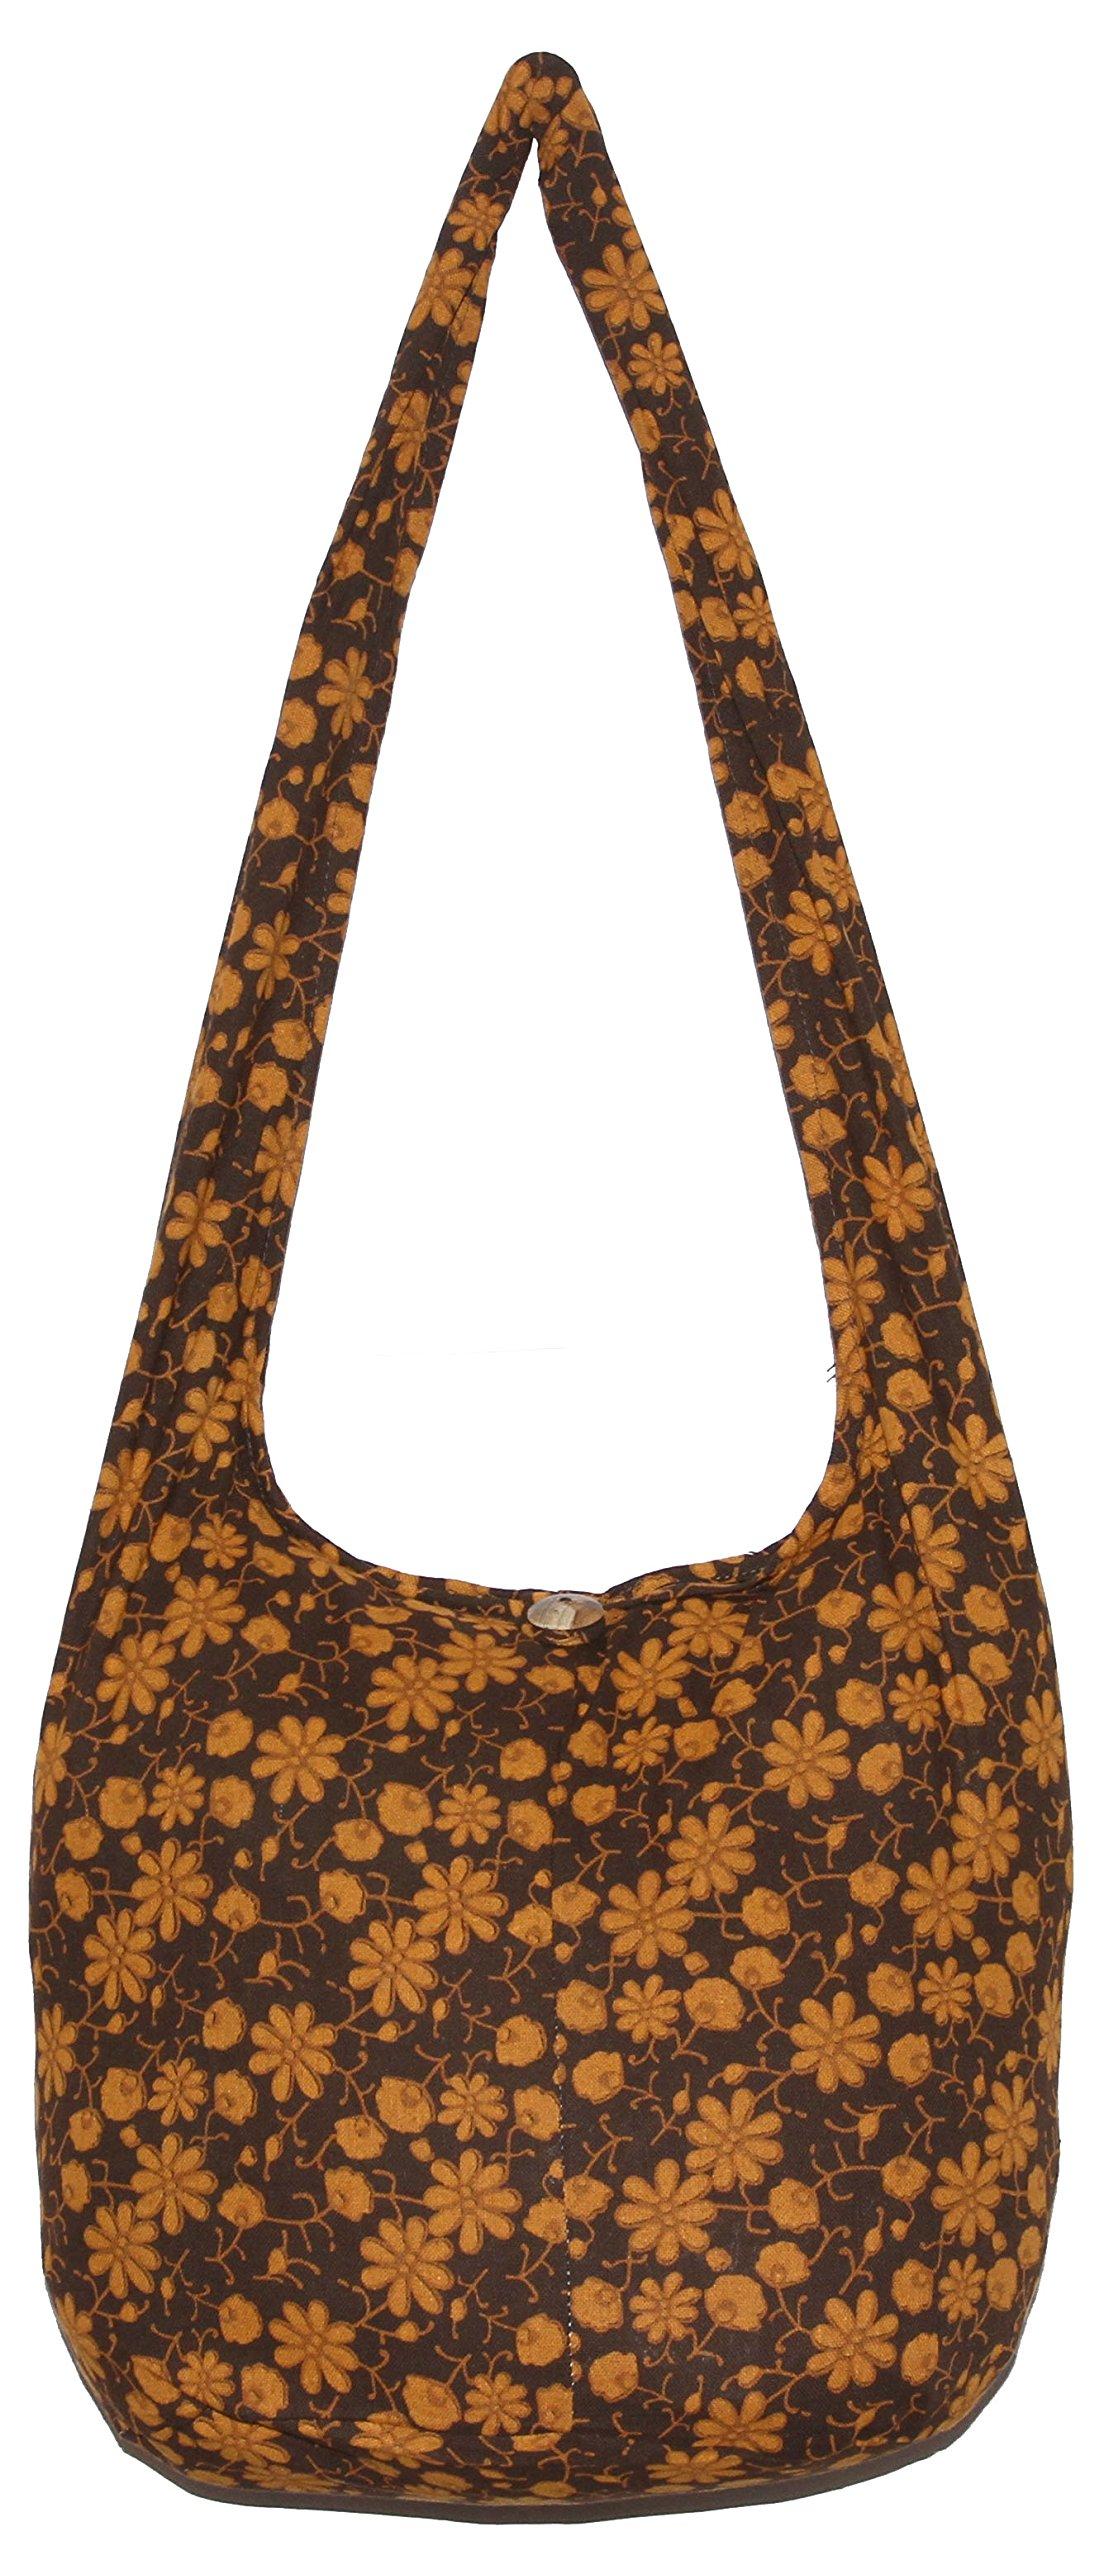 Flower Classics Bohemian Hippie Shoulder Hobo Boho Cross Body Bag (DarkBrown) by All Best Thing